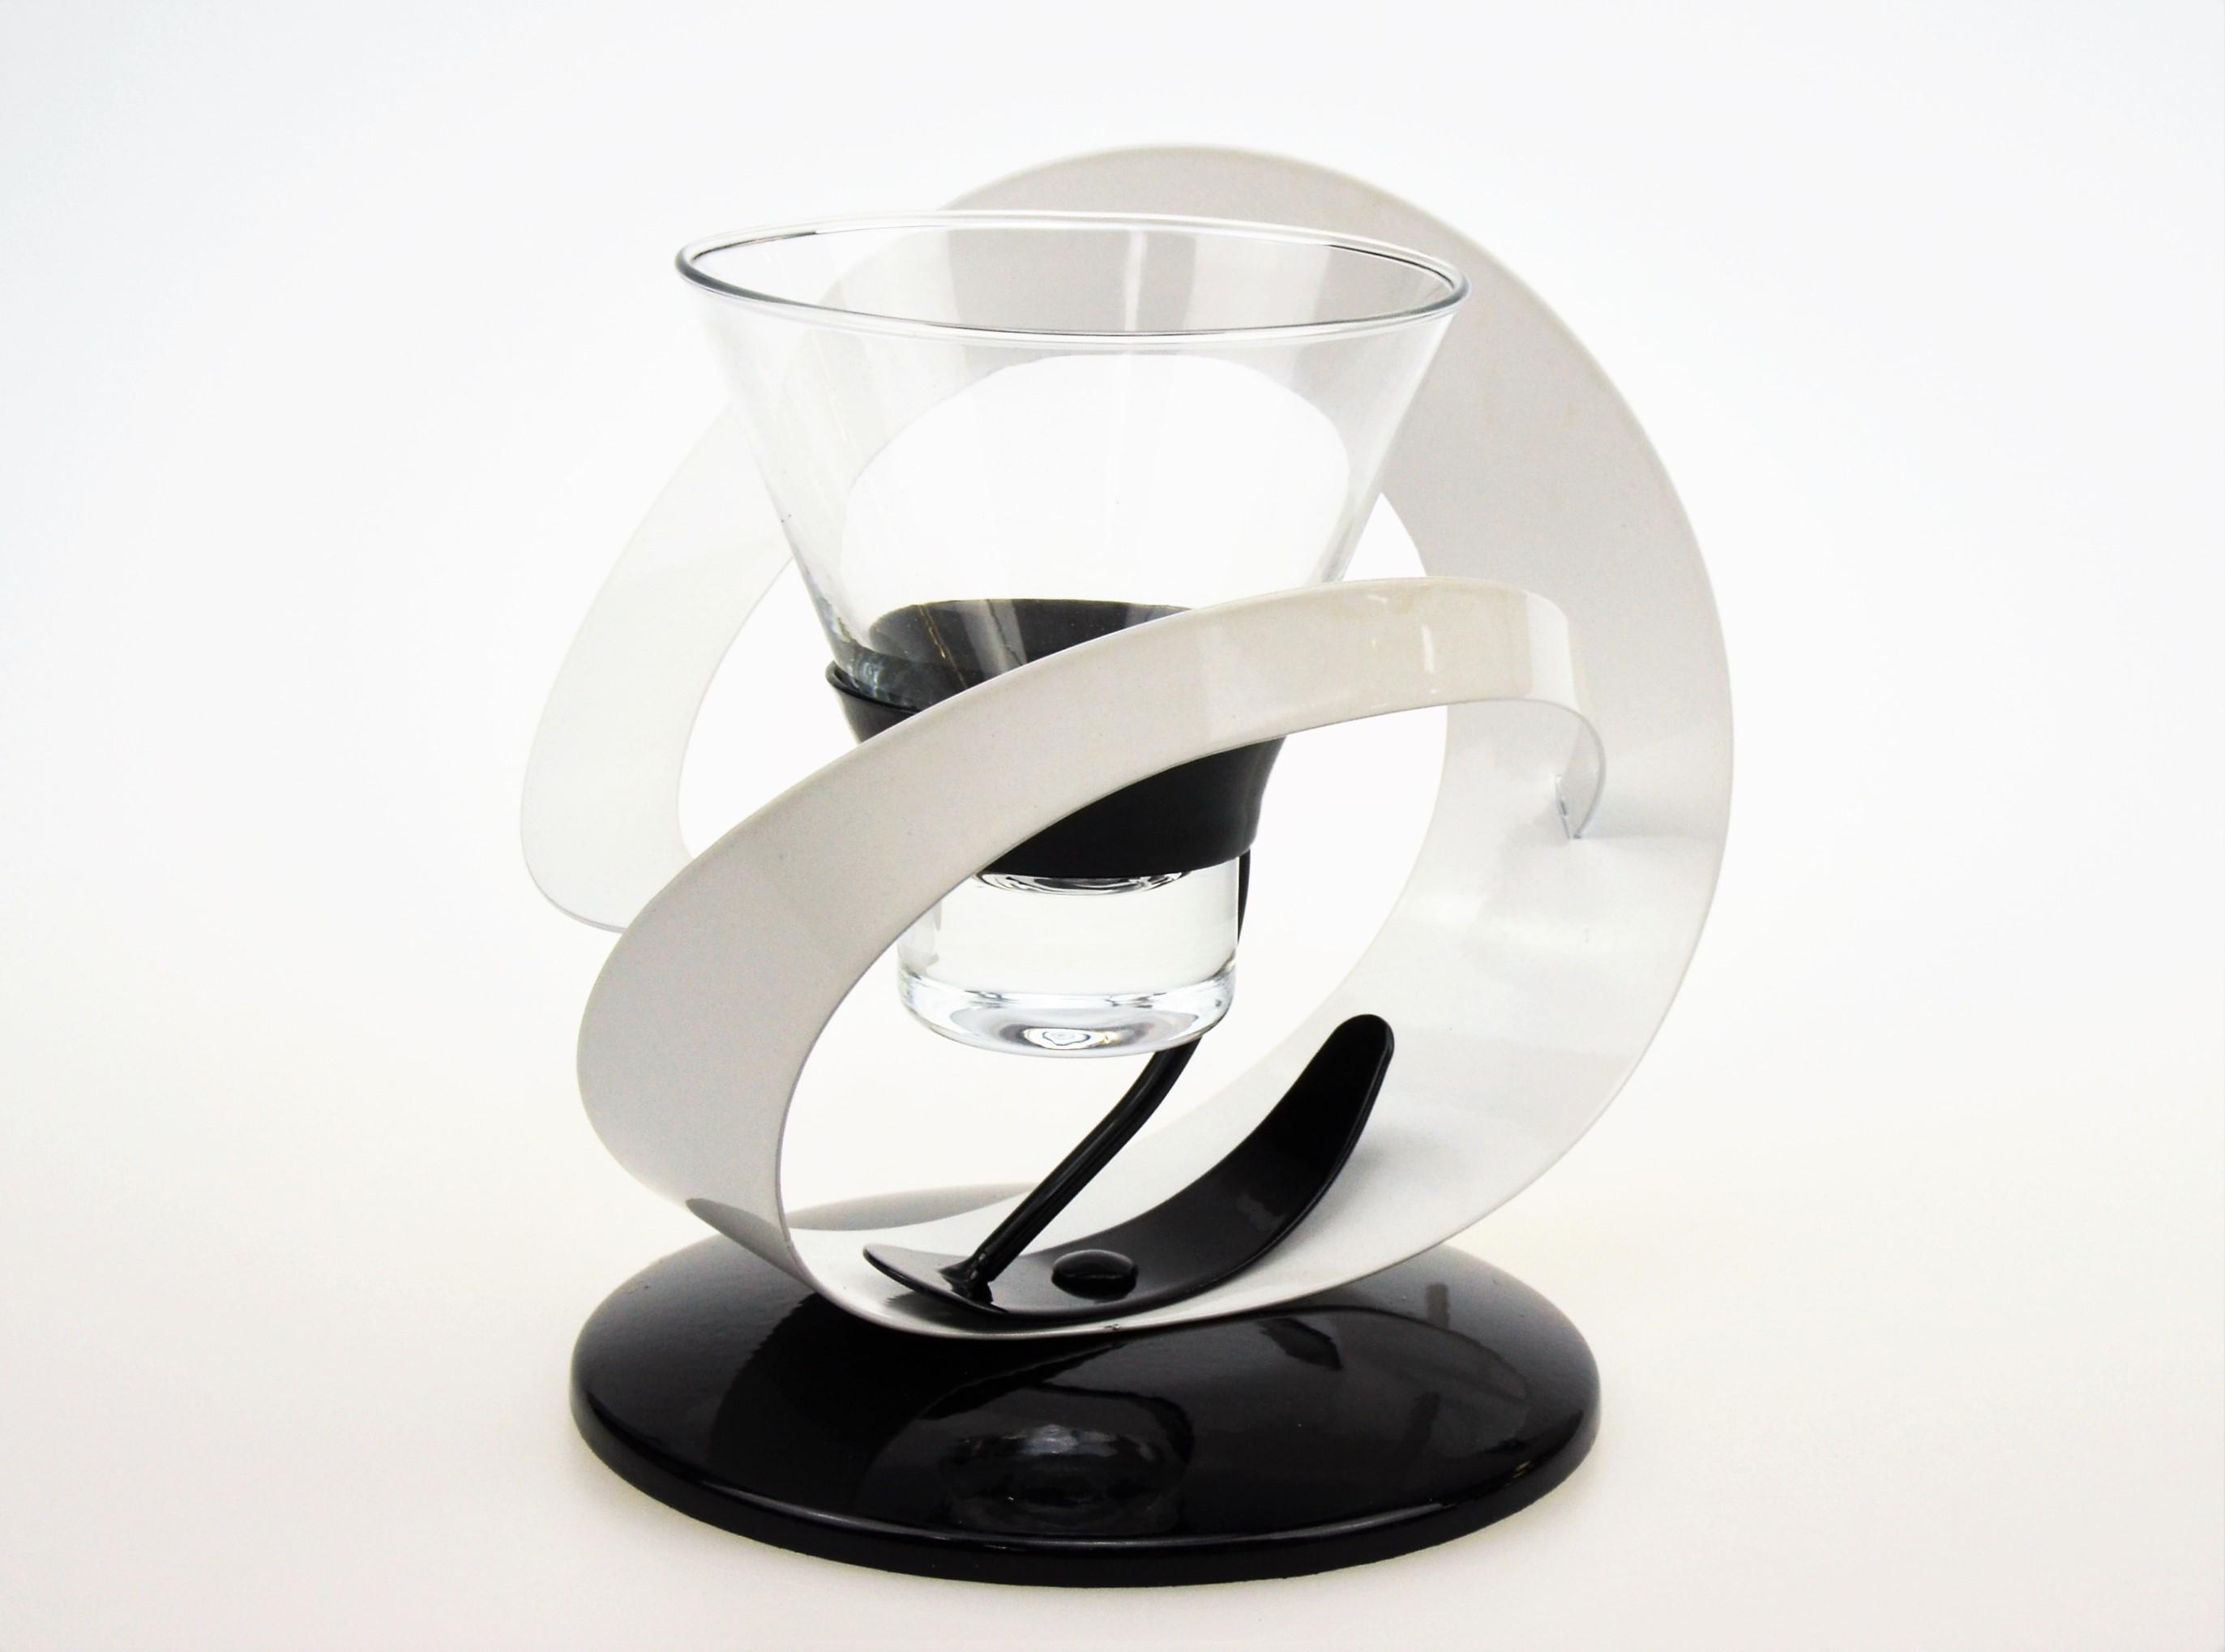 Candle Tea Light Holder Candlestick Black & White Glass & Metal set of 10 (4 single, 3 double, 3 lamp)